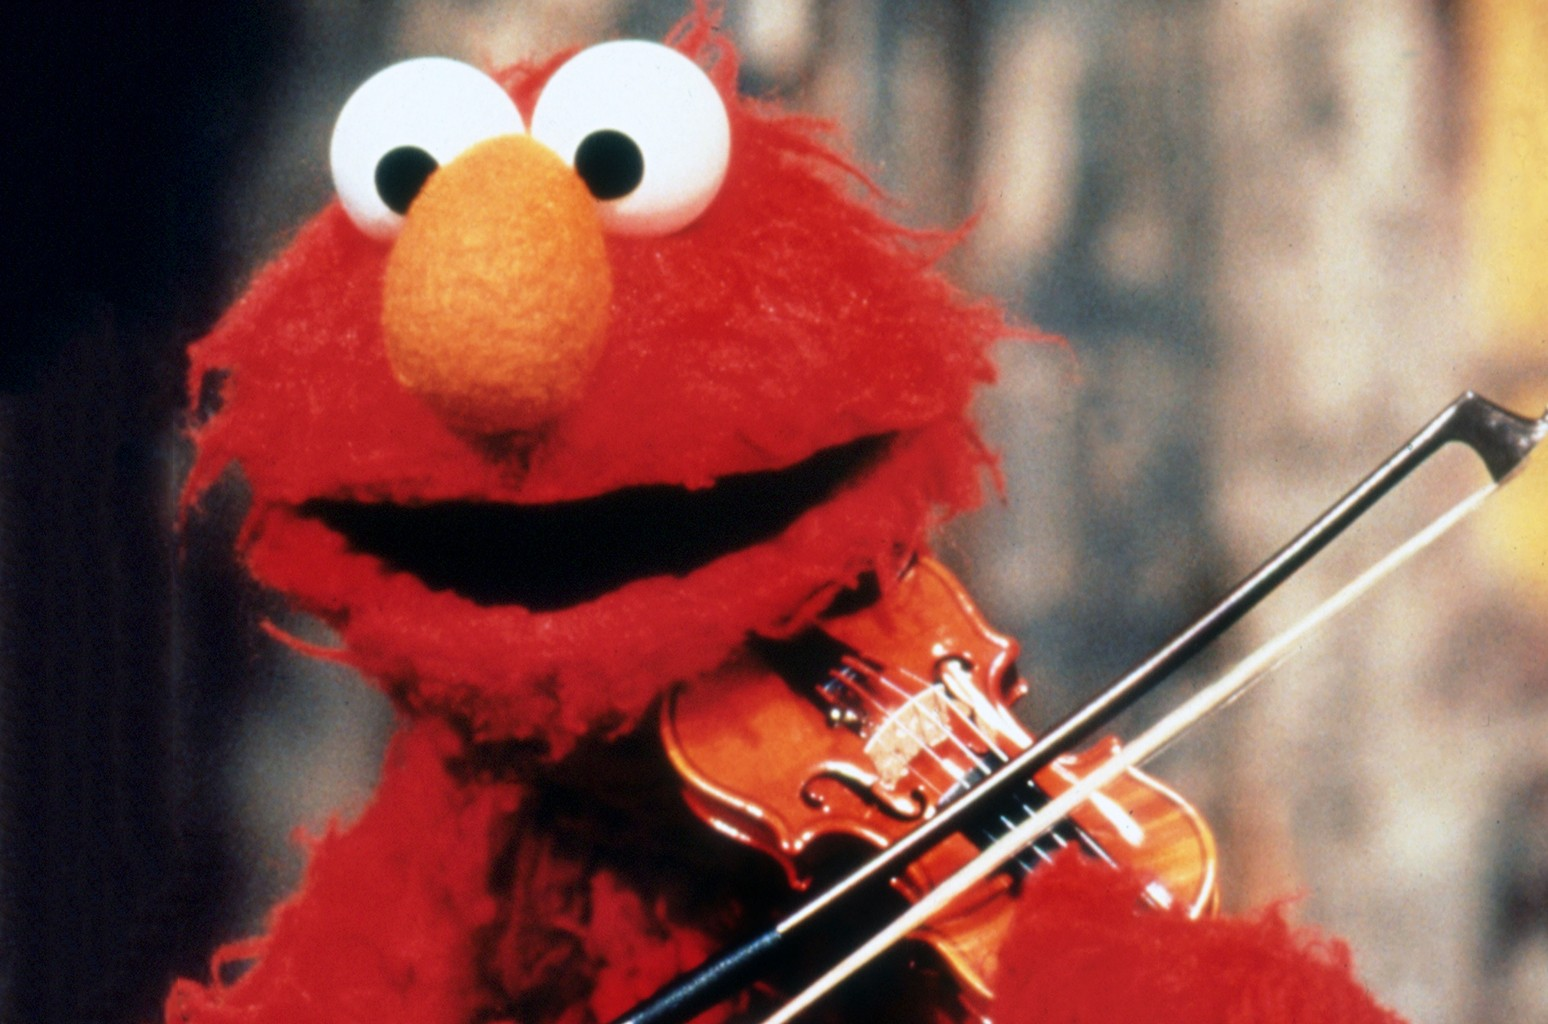 Elmo on Sesame Street.